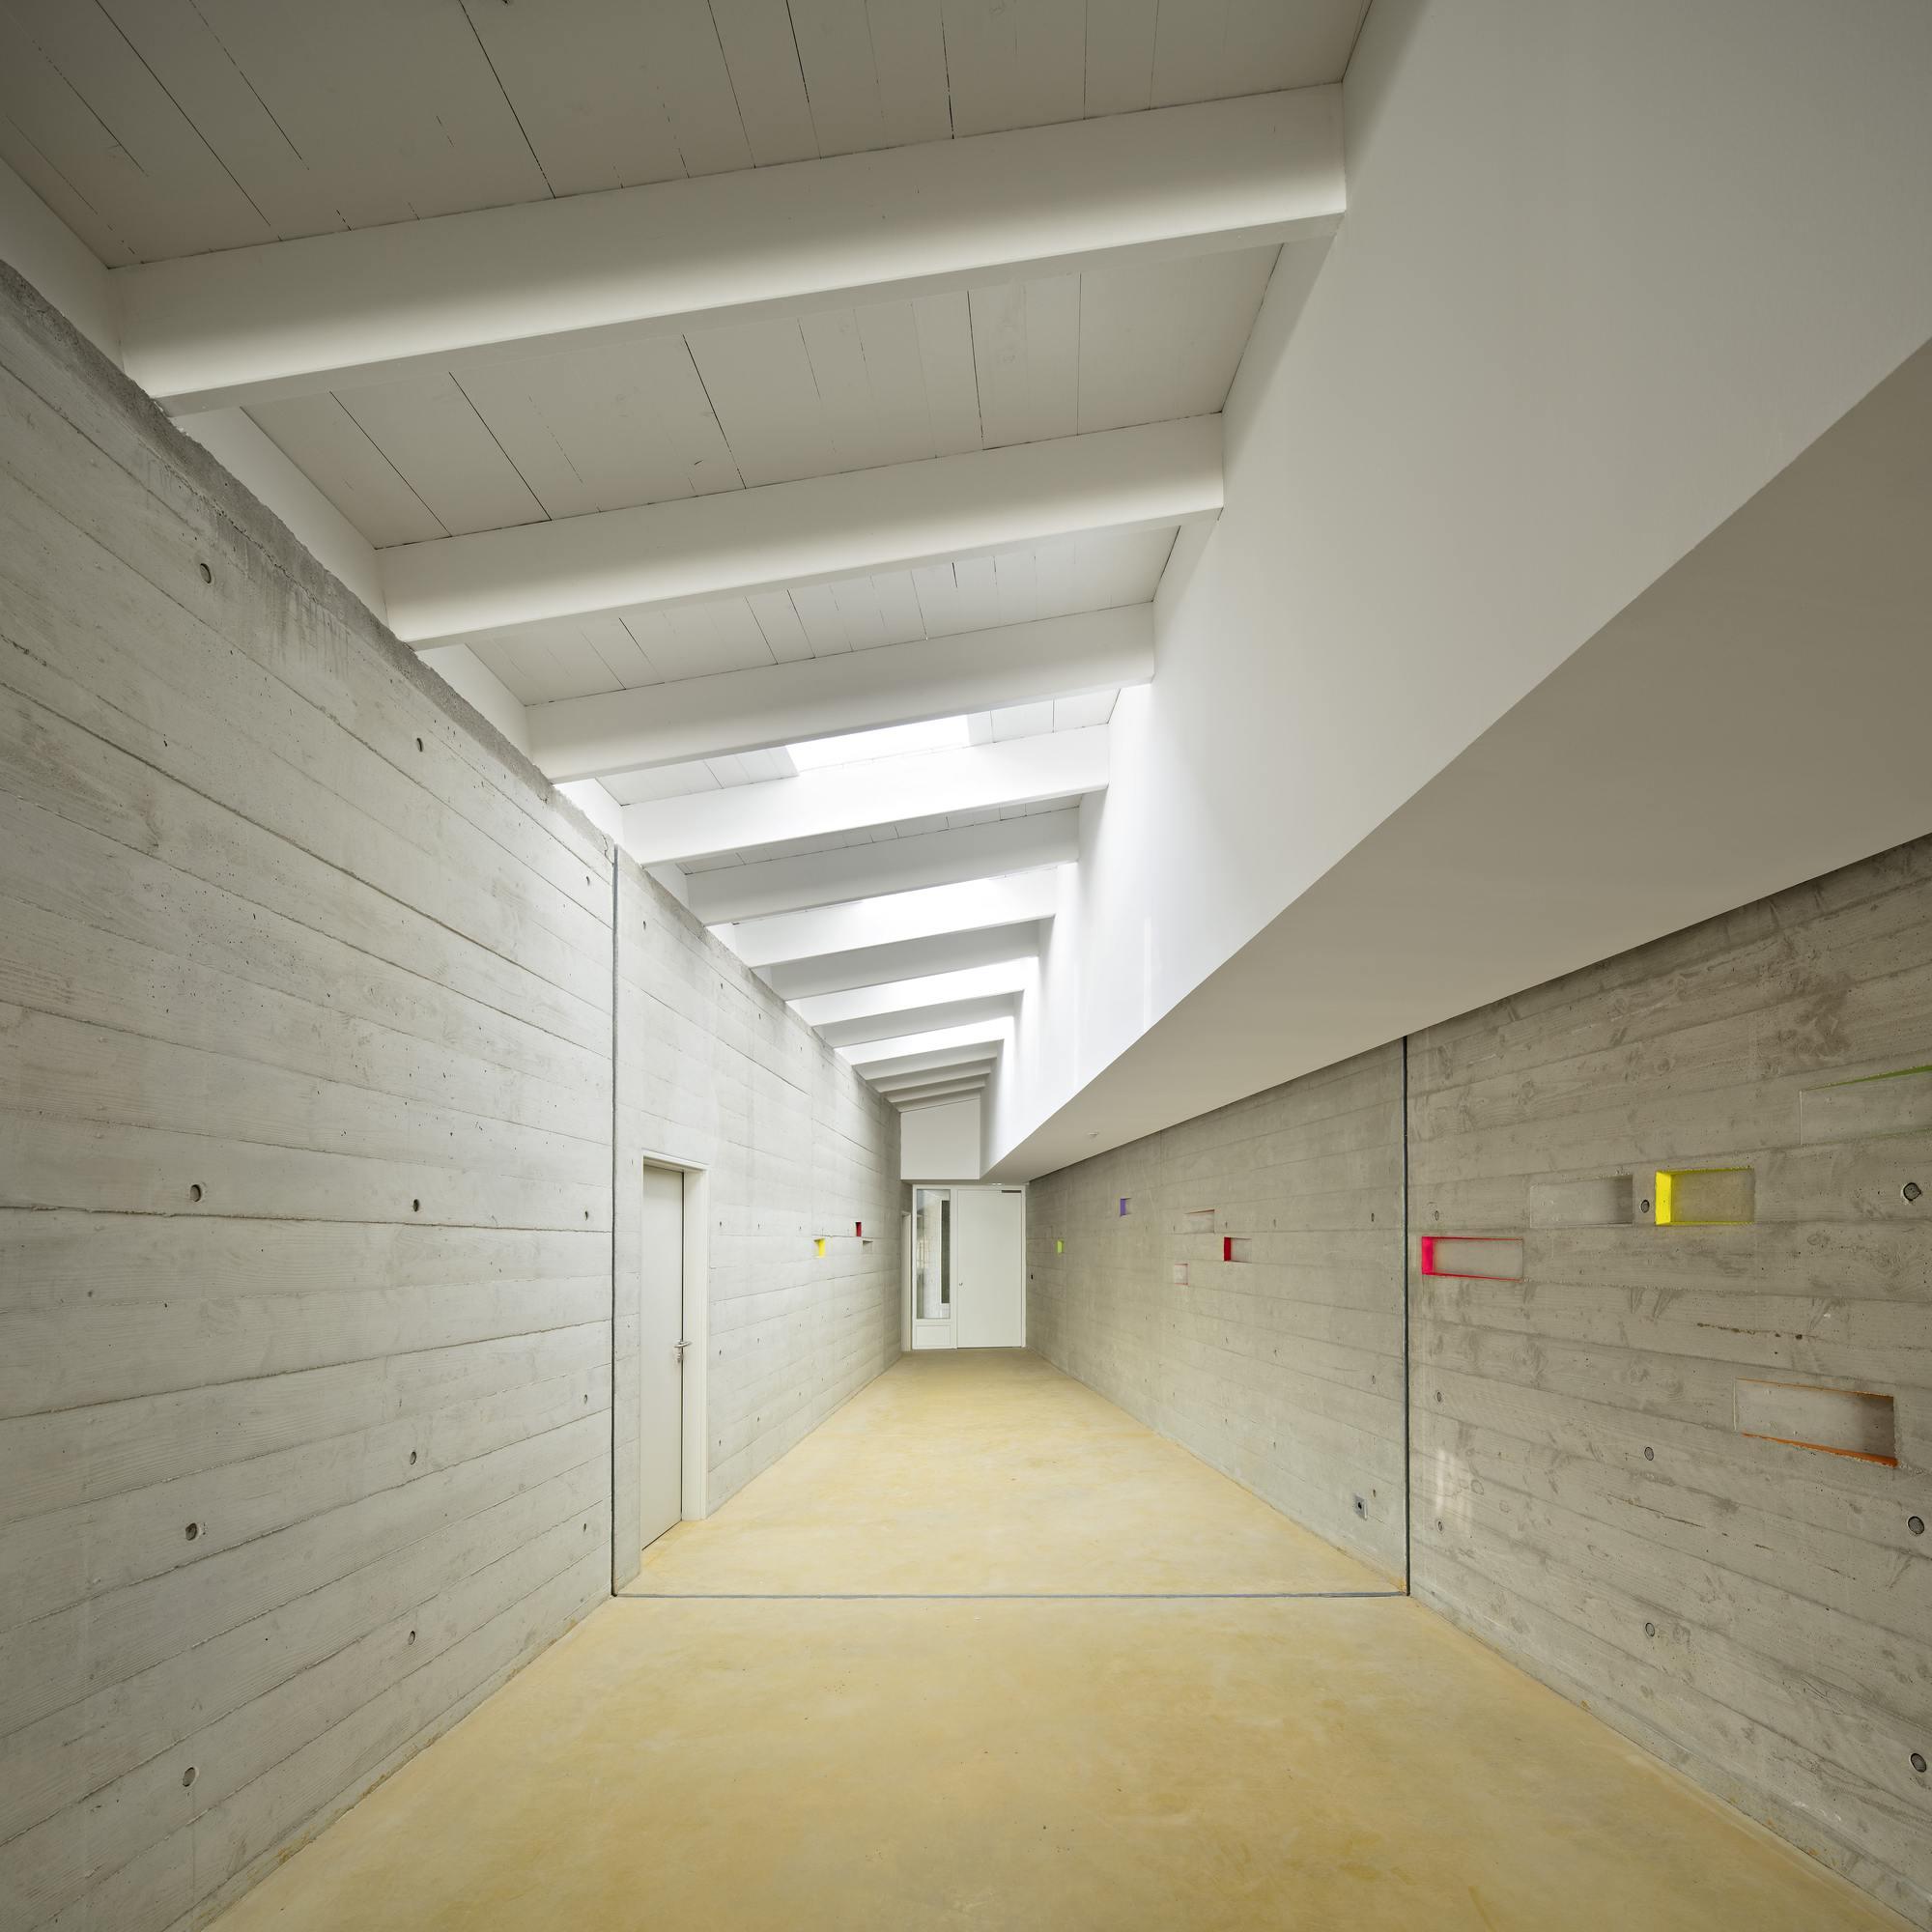 gallery of juvenile detention educational facility combas architectes 16. Black Bedroom Furniture Sets. Home Design Ideas